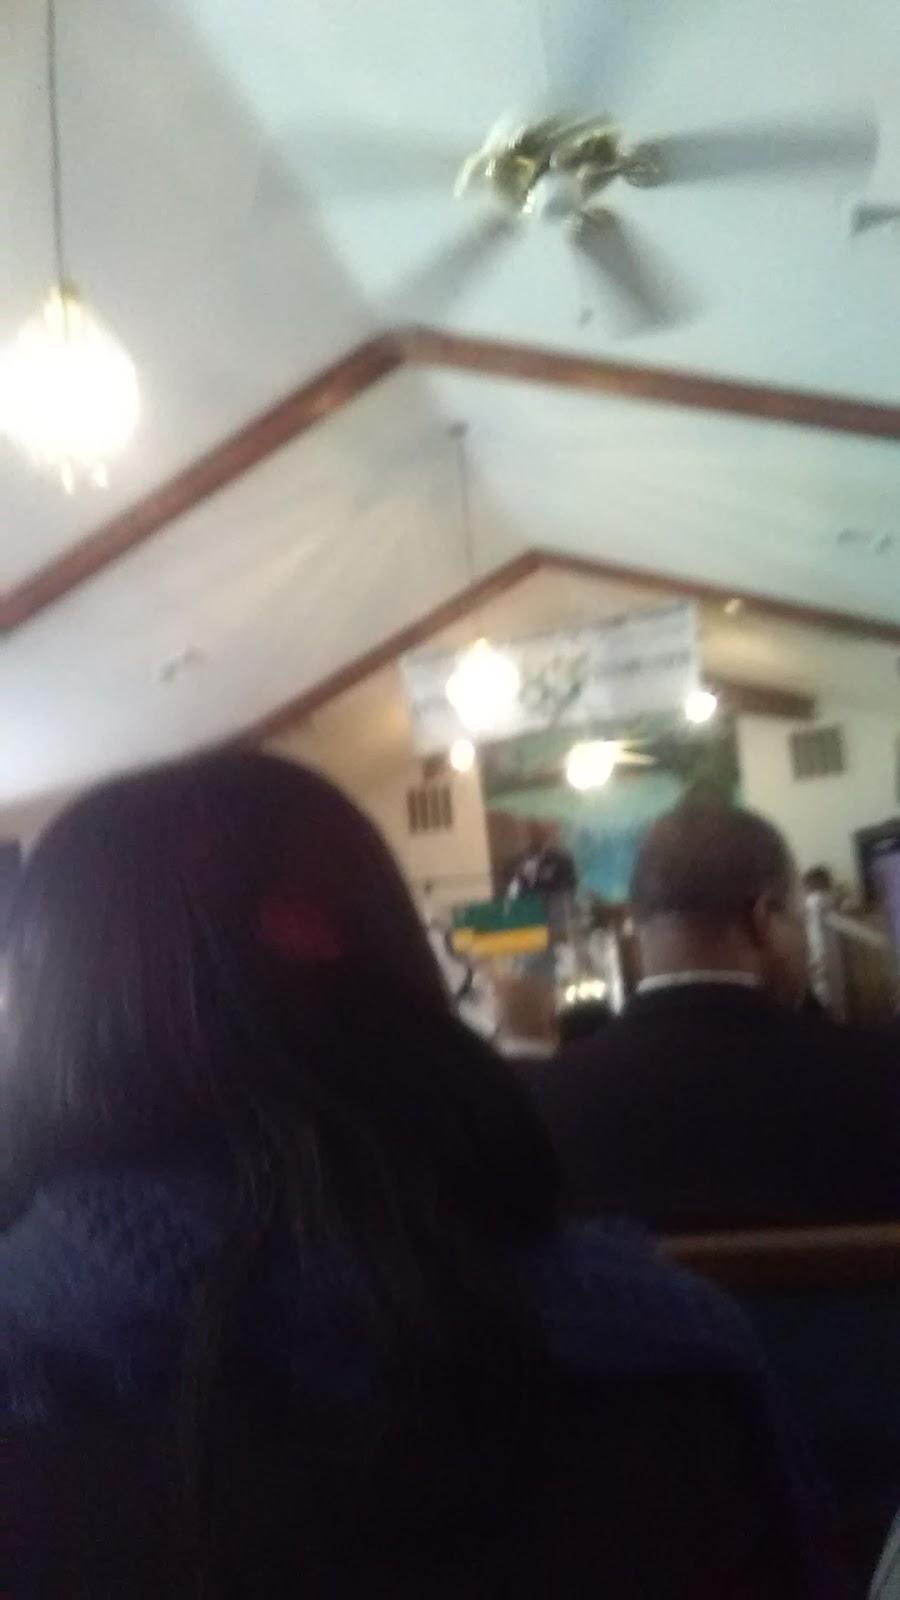 Greater Sweet Beulah Holiness - church  | Photo 3 of 4 | Address: 137 Maple St, Suffolk, VA 23434, USA | Phone: (757) 539-9535